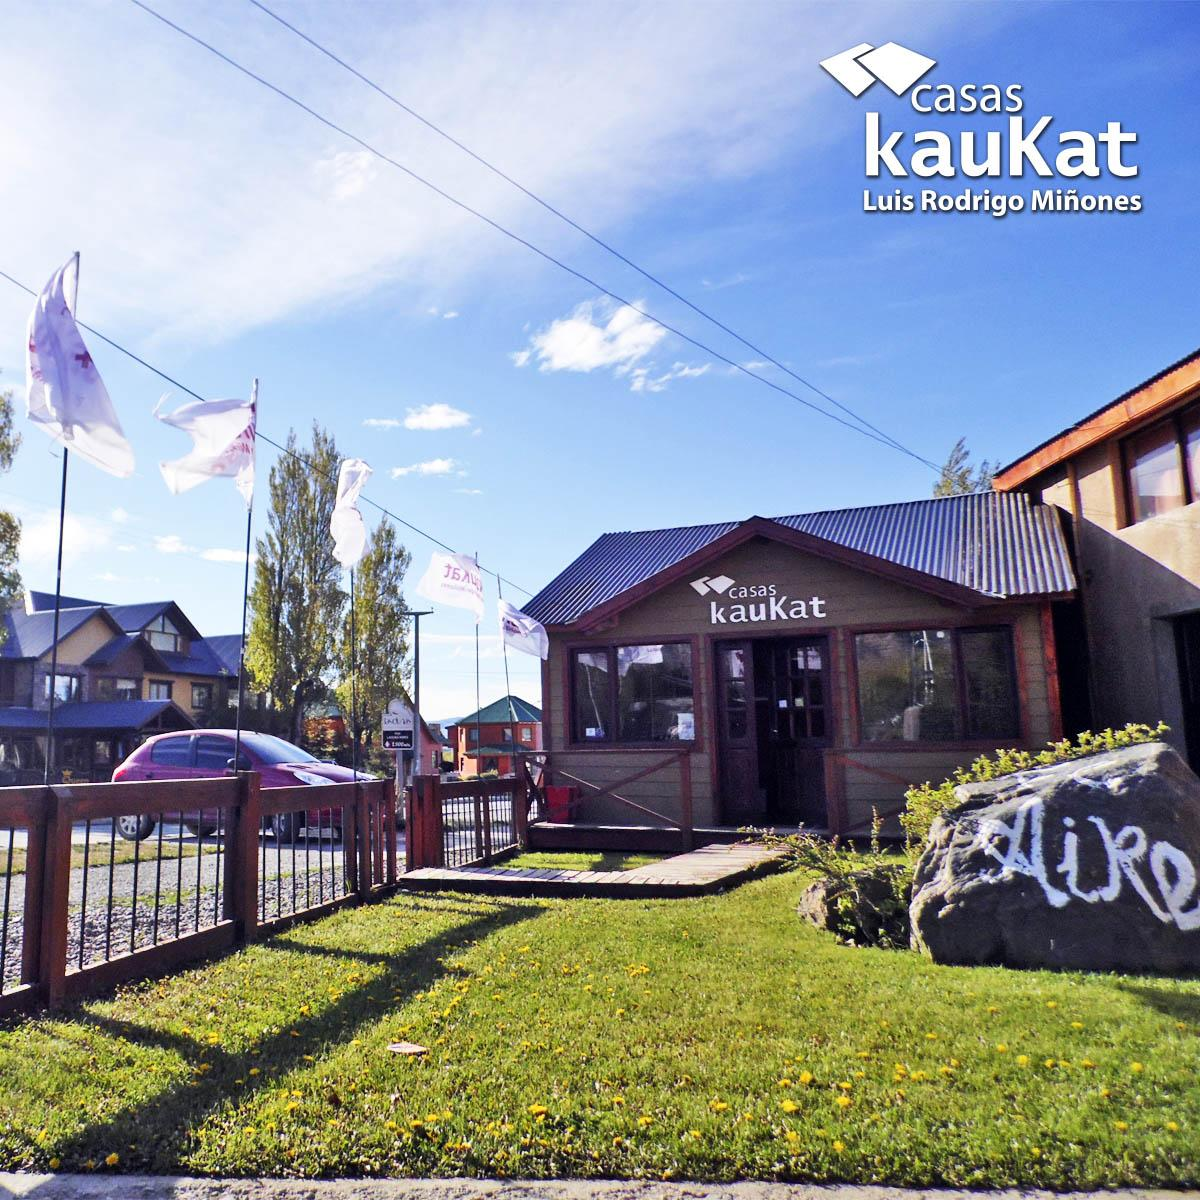 planos de casas kaukat